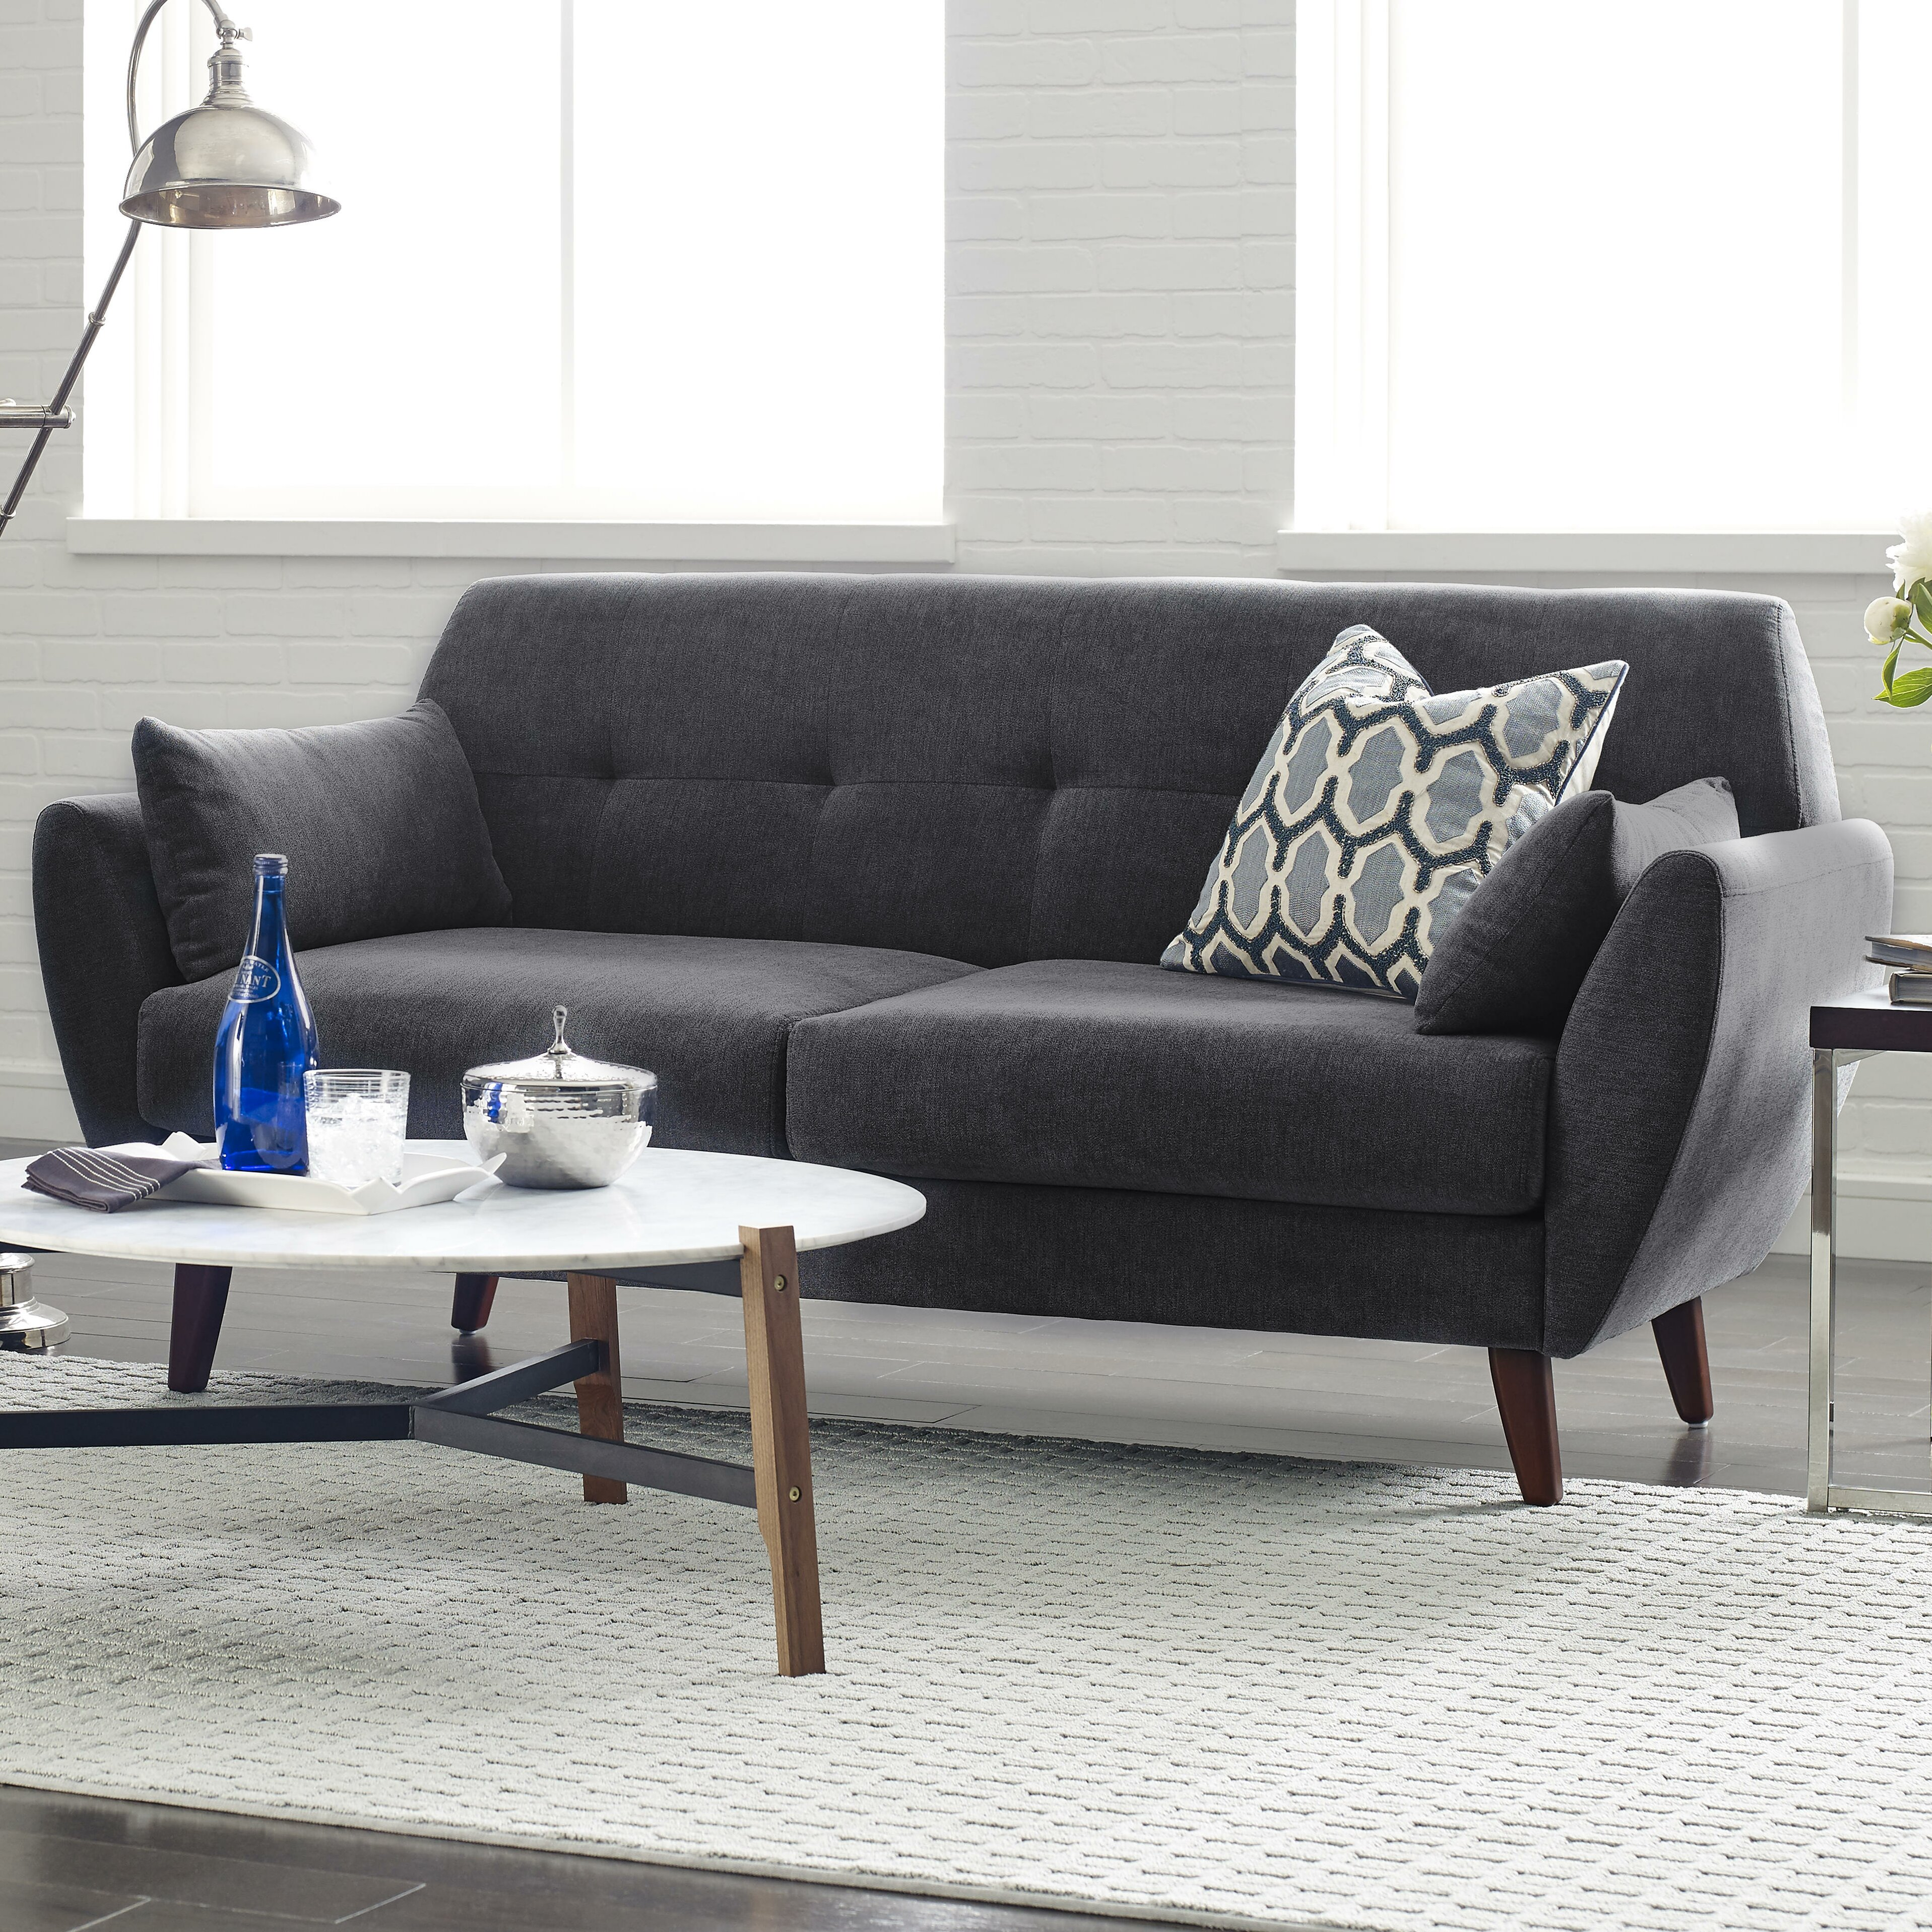 Serta Living Room Furniture Serta At Home Artesia Living Room Collection Reviews Wayfair